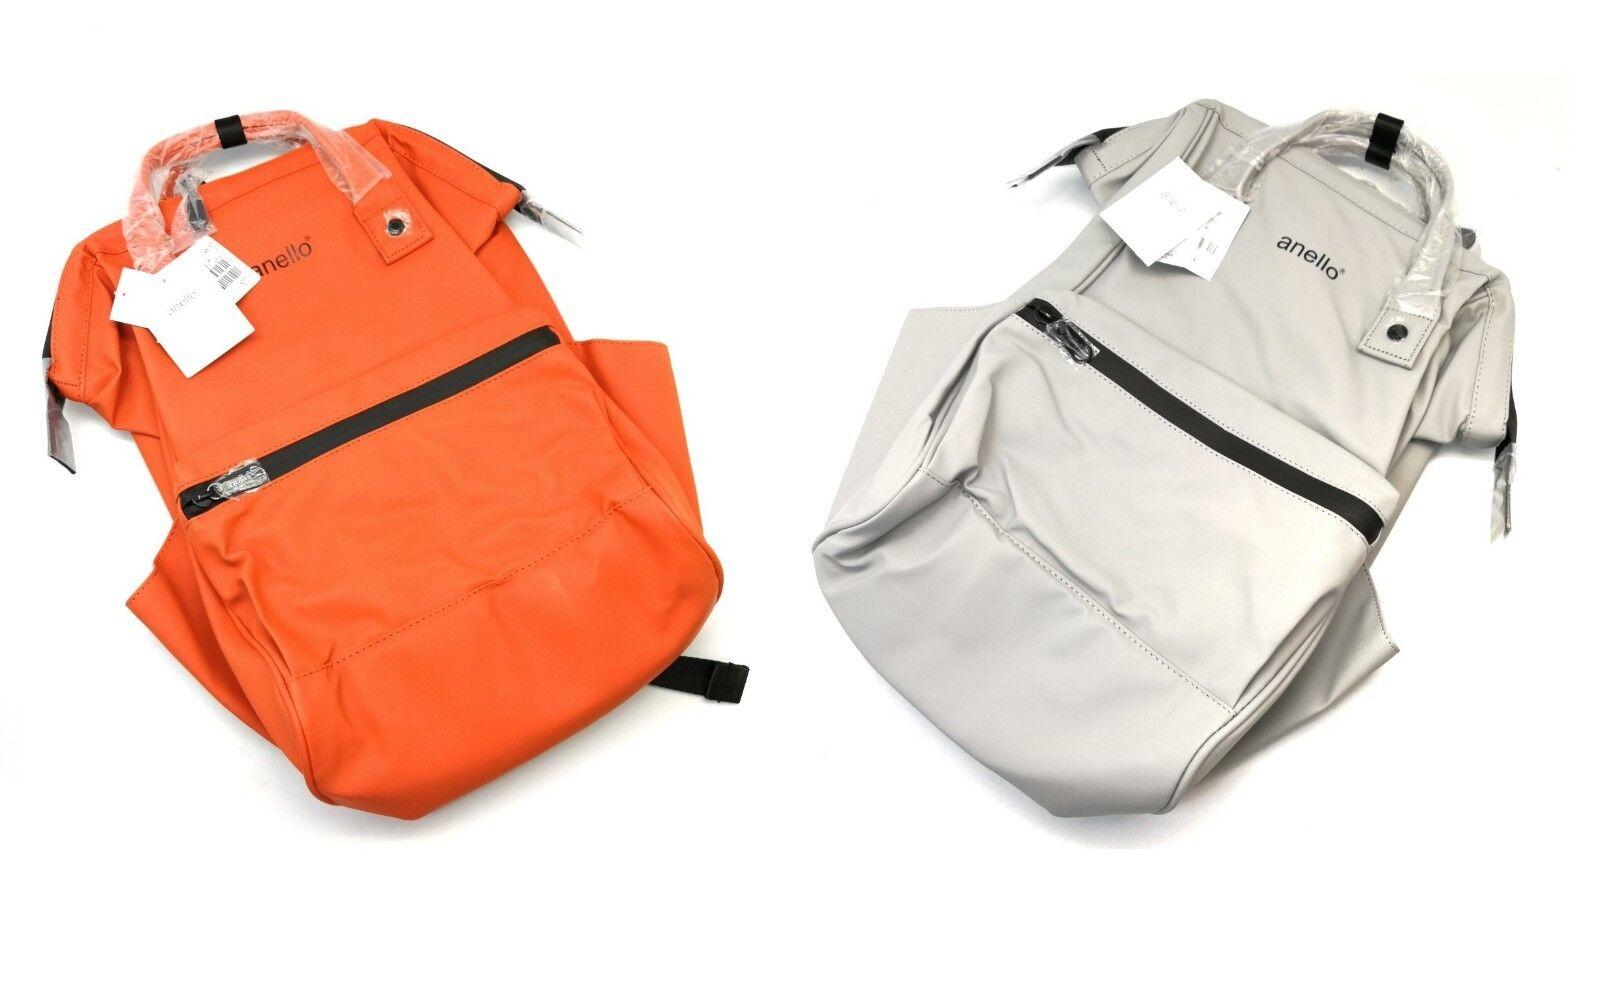 27ecc4fdf9 Anello Backpack Rucksack Unisex Canvas Bag AT-B2811 Made in Japan   eBay